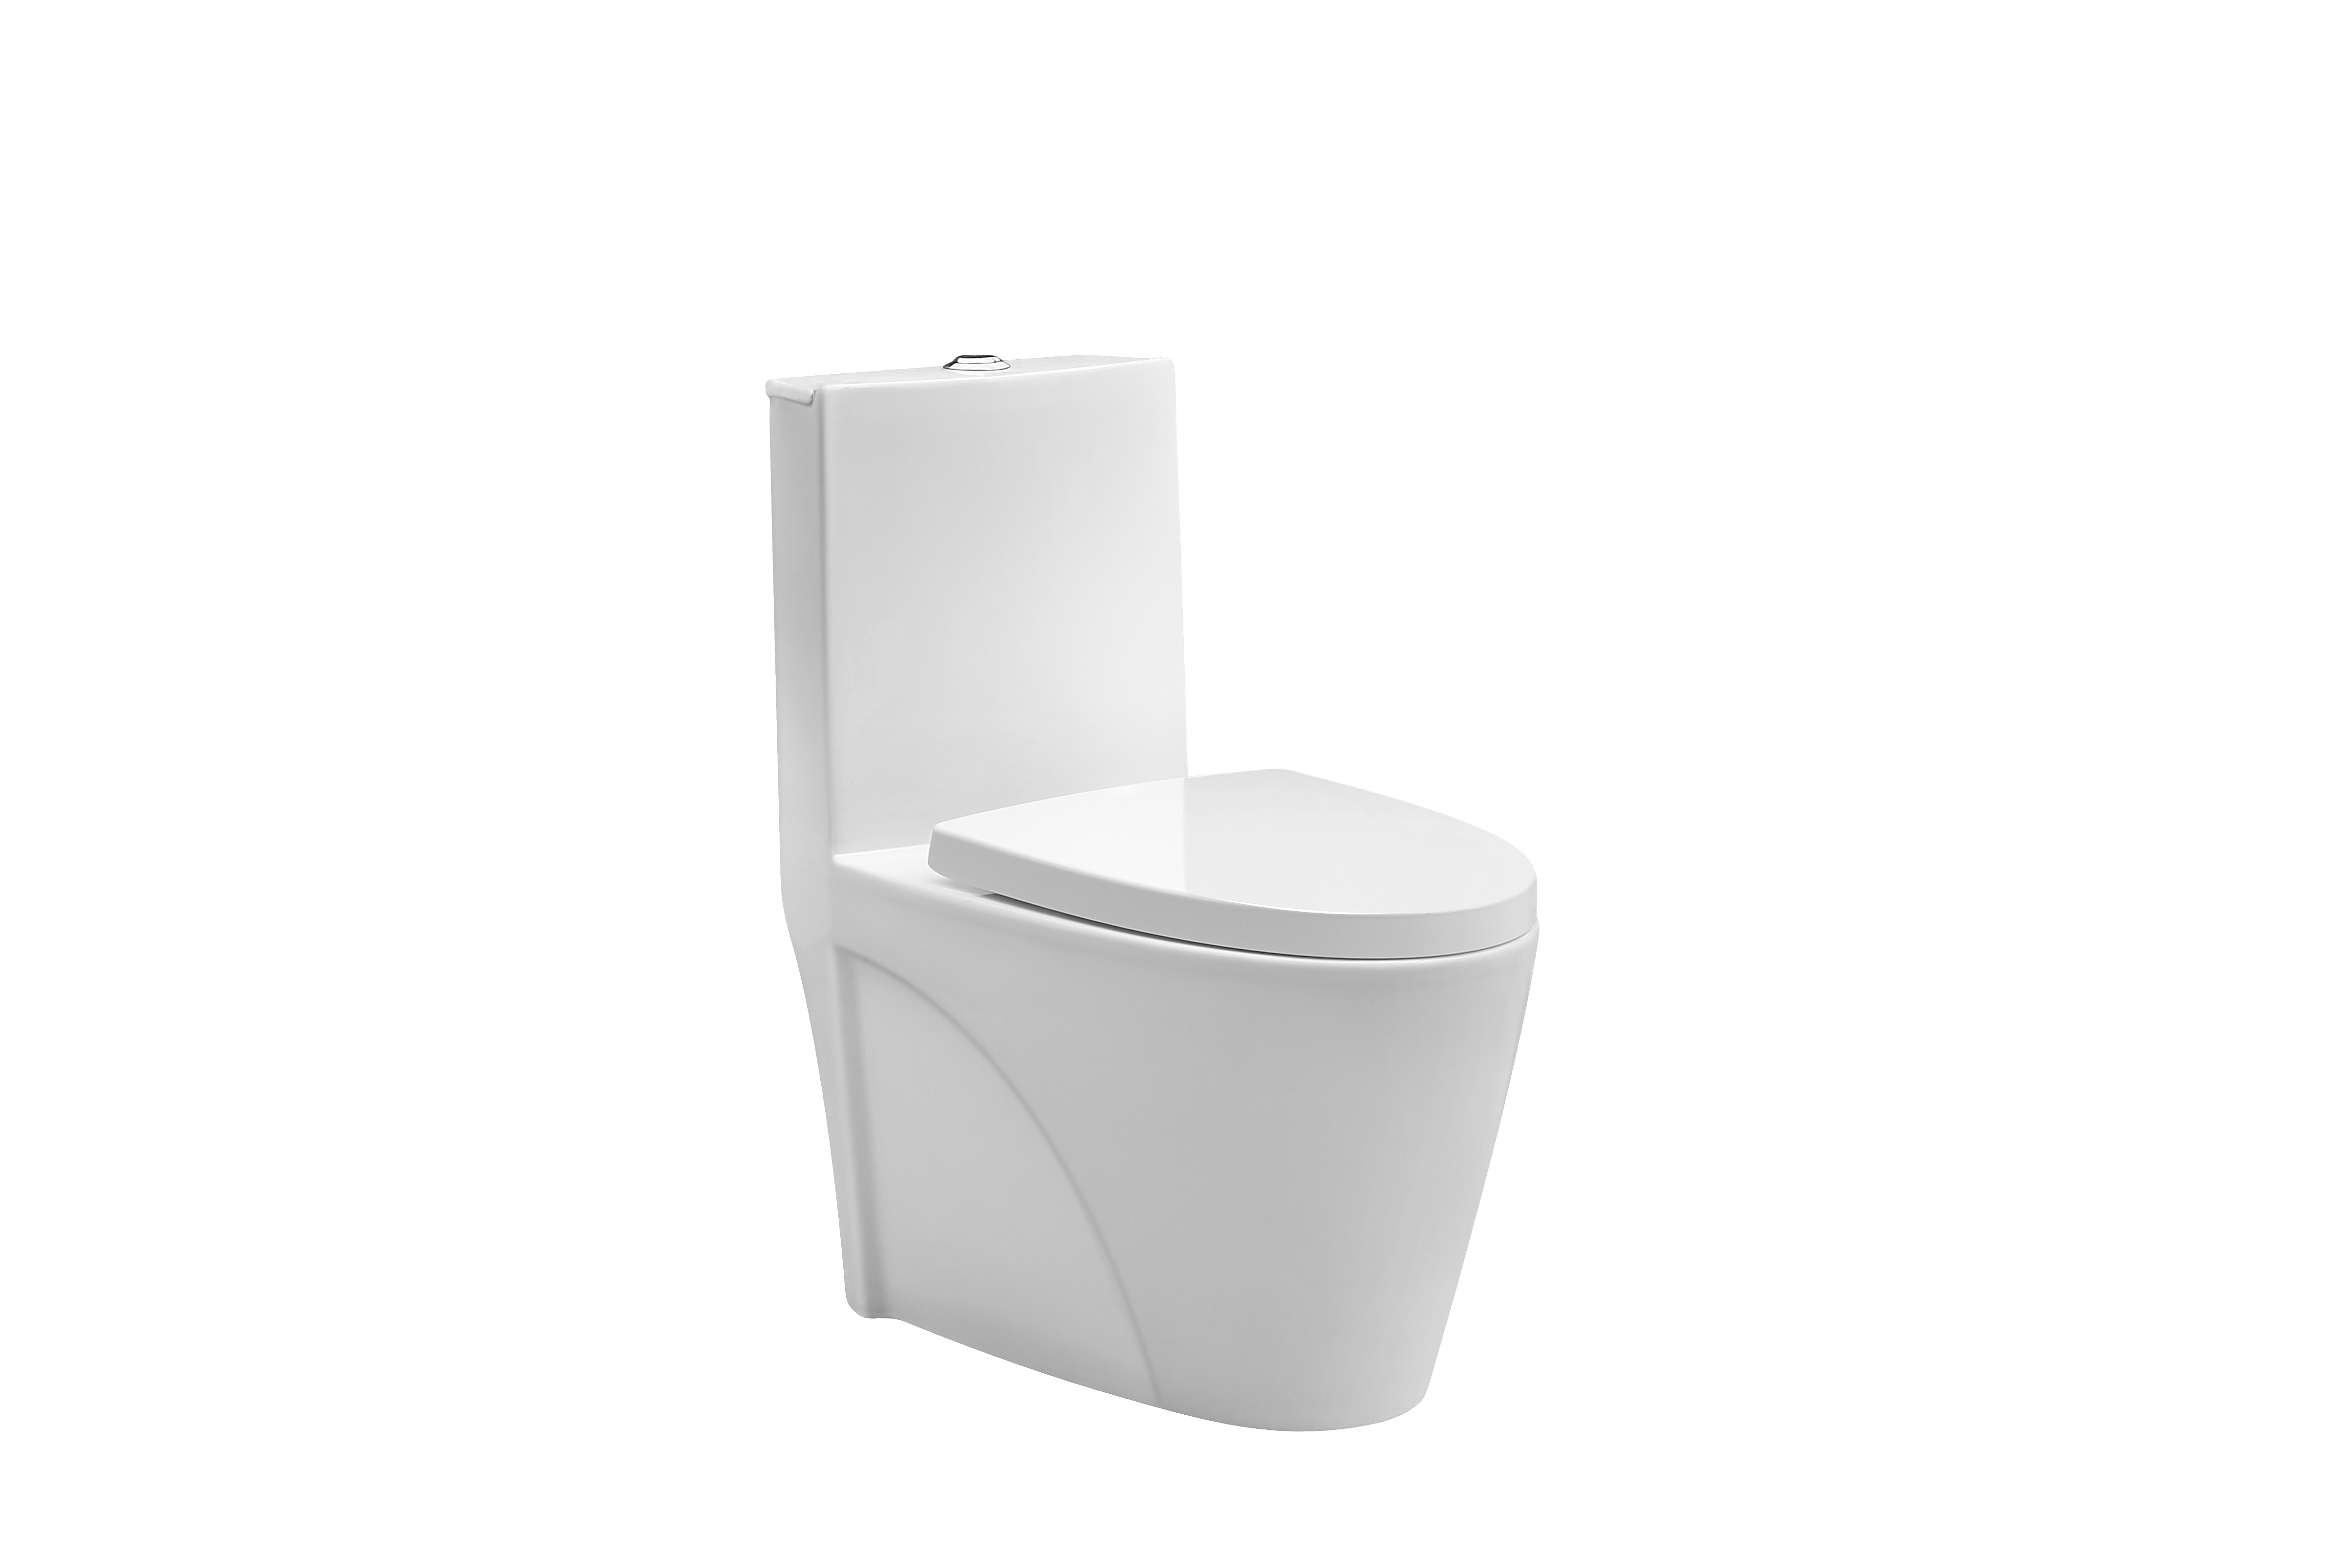 Sanitary ware one-piece bathroom floor mounted ceramic wc washdown toilet